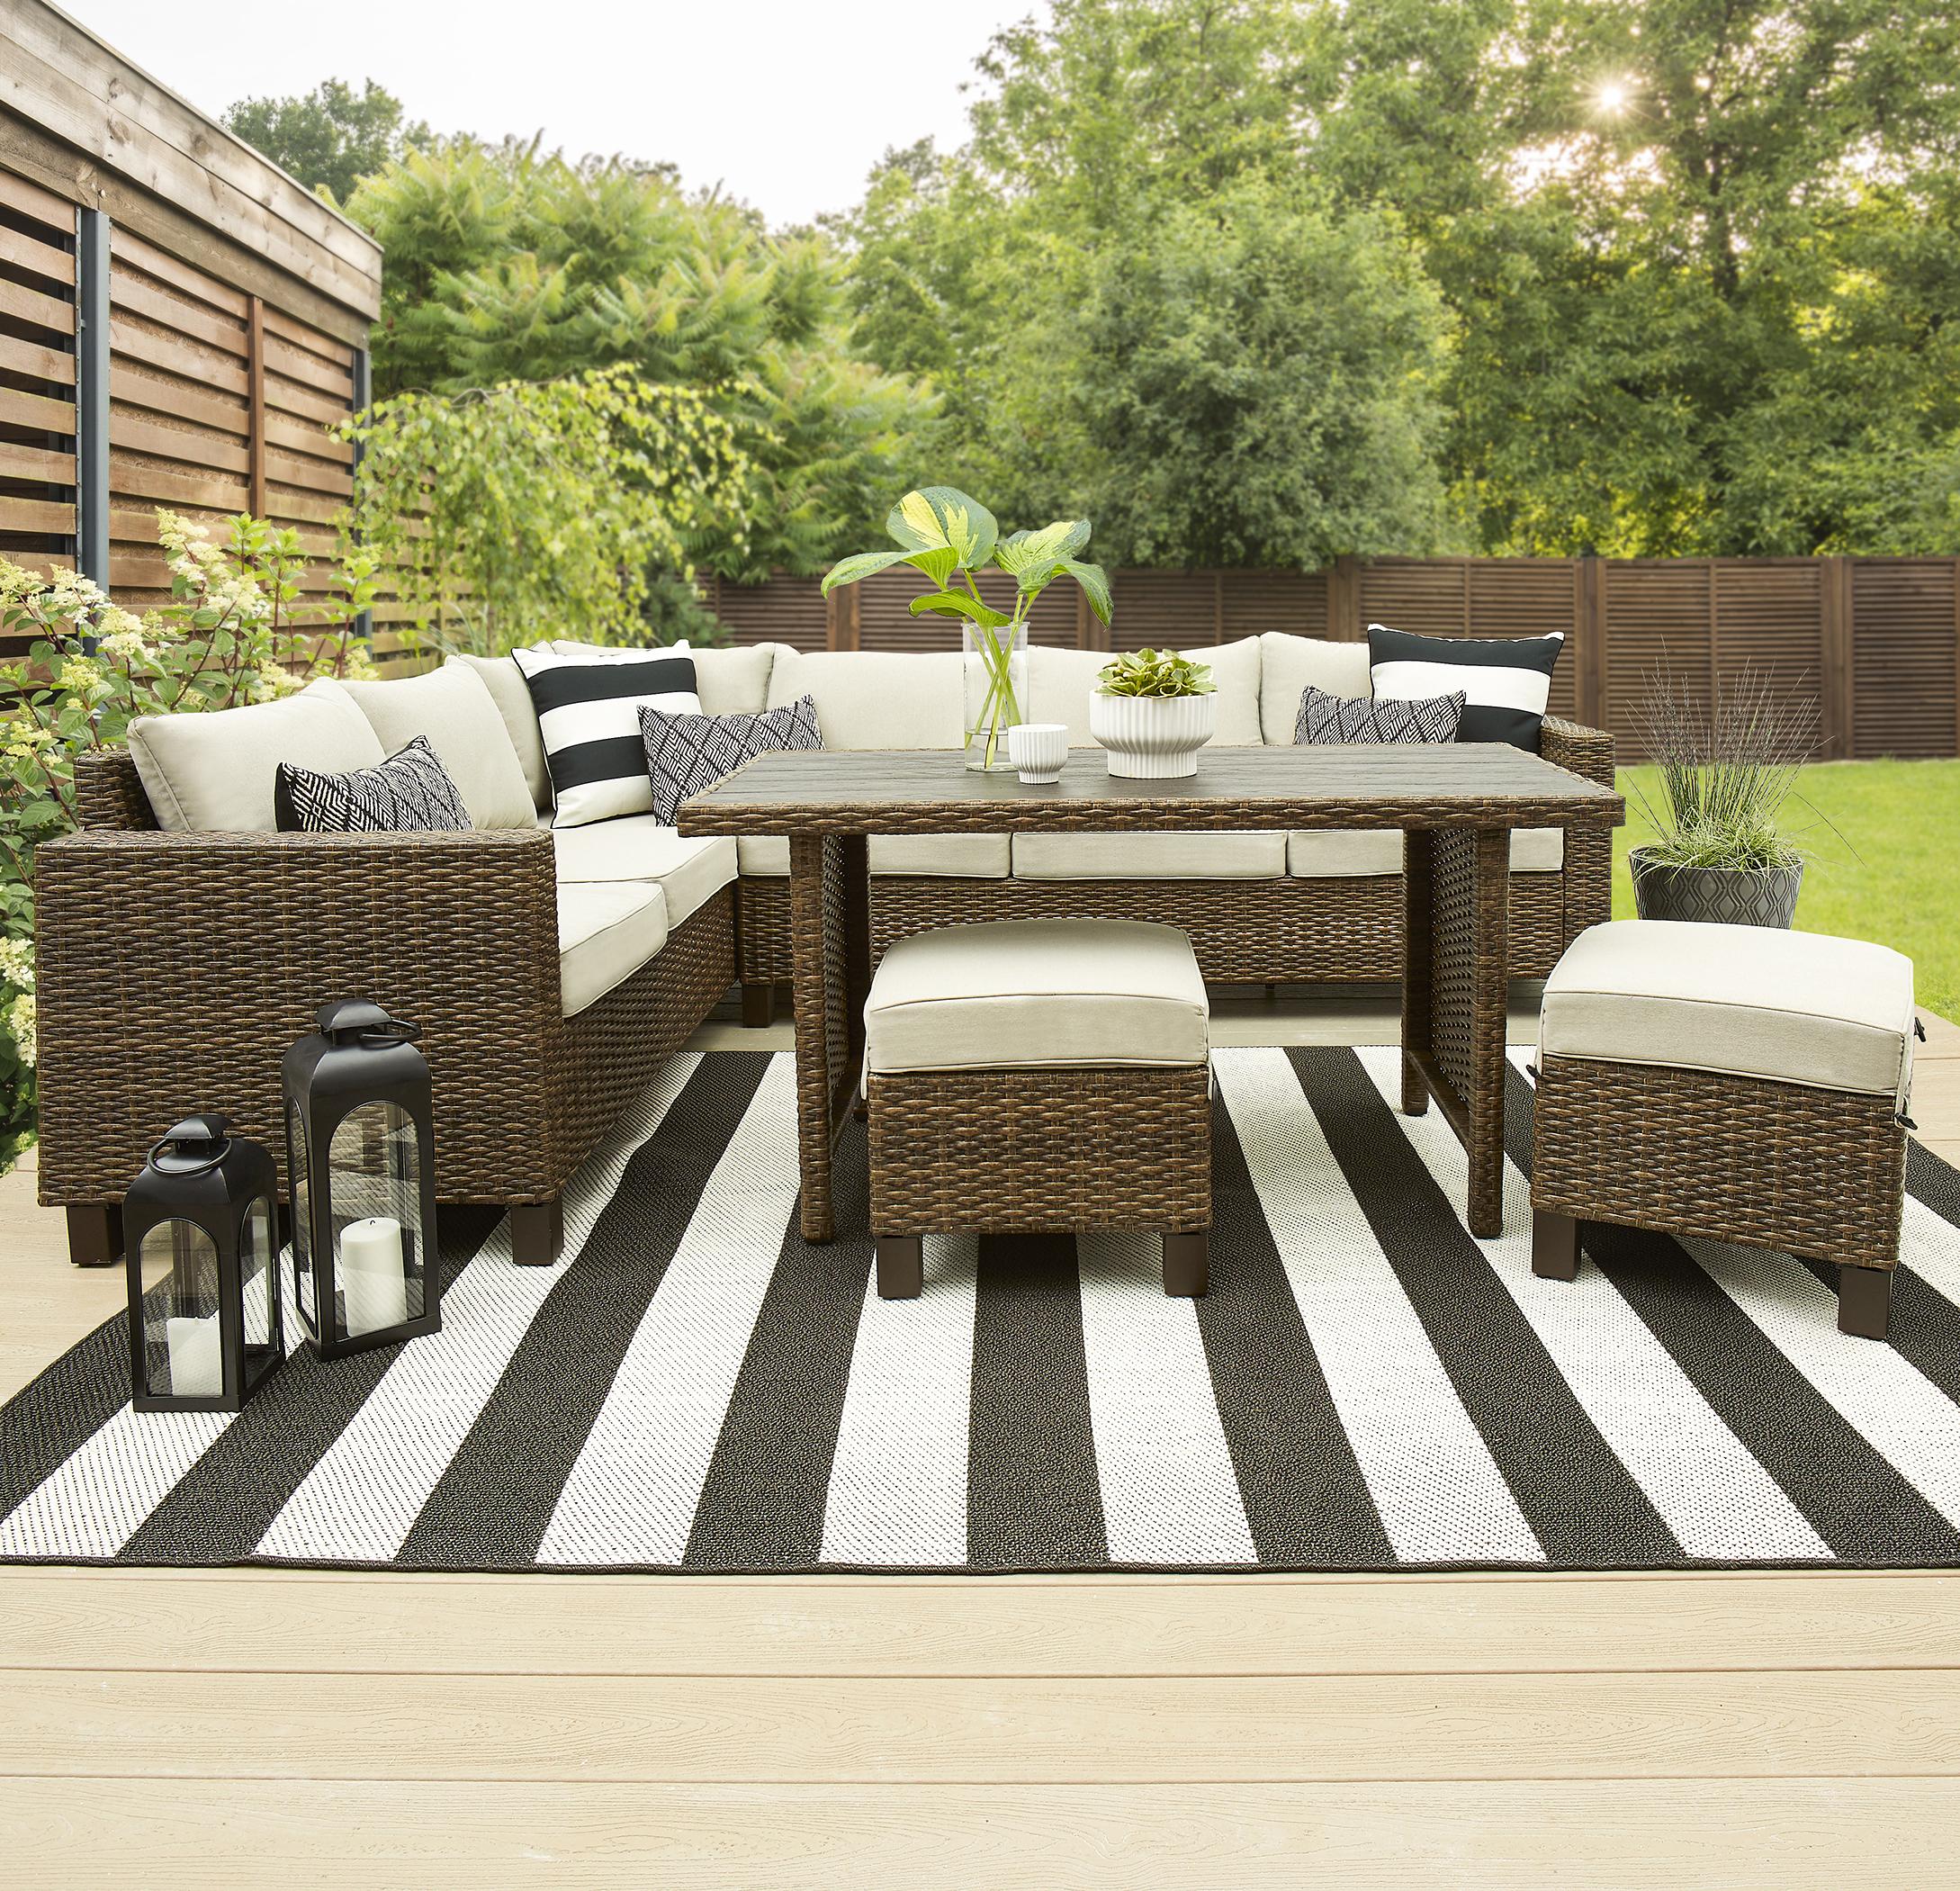 Walmart Better Homes and Garden 5 piece Wicker Outdoor Dining Set $355 YMMV